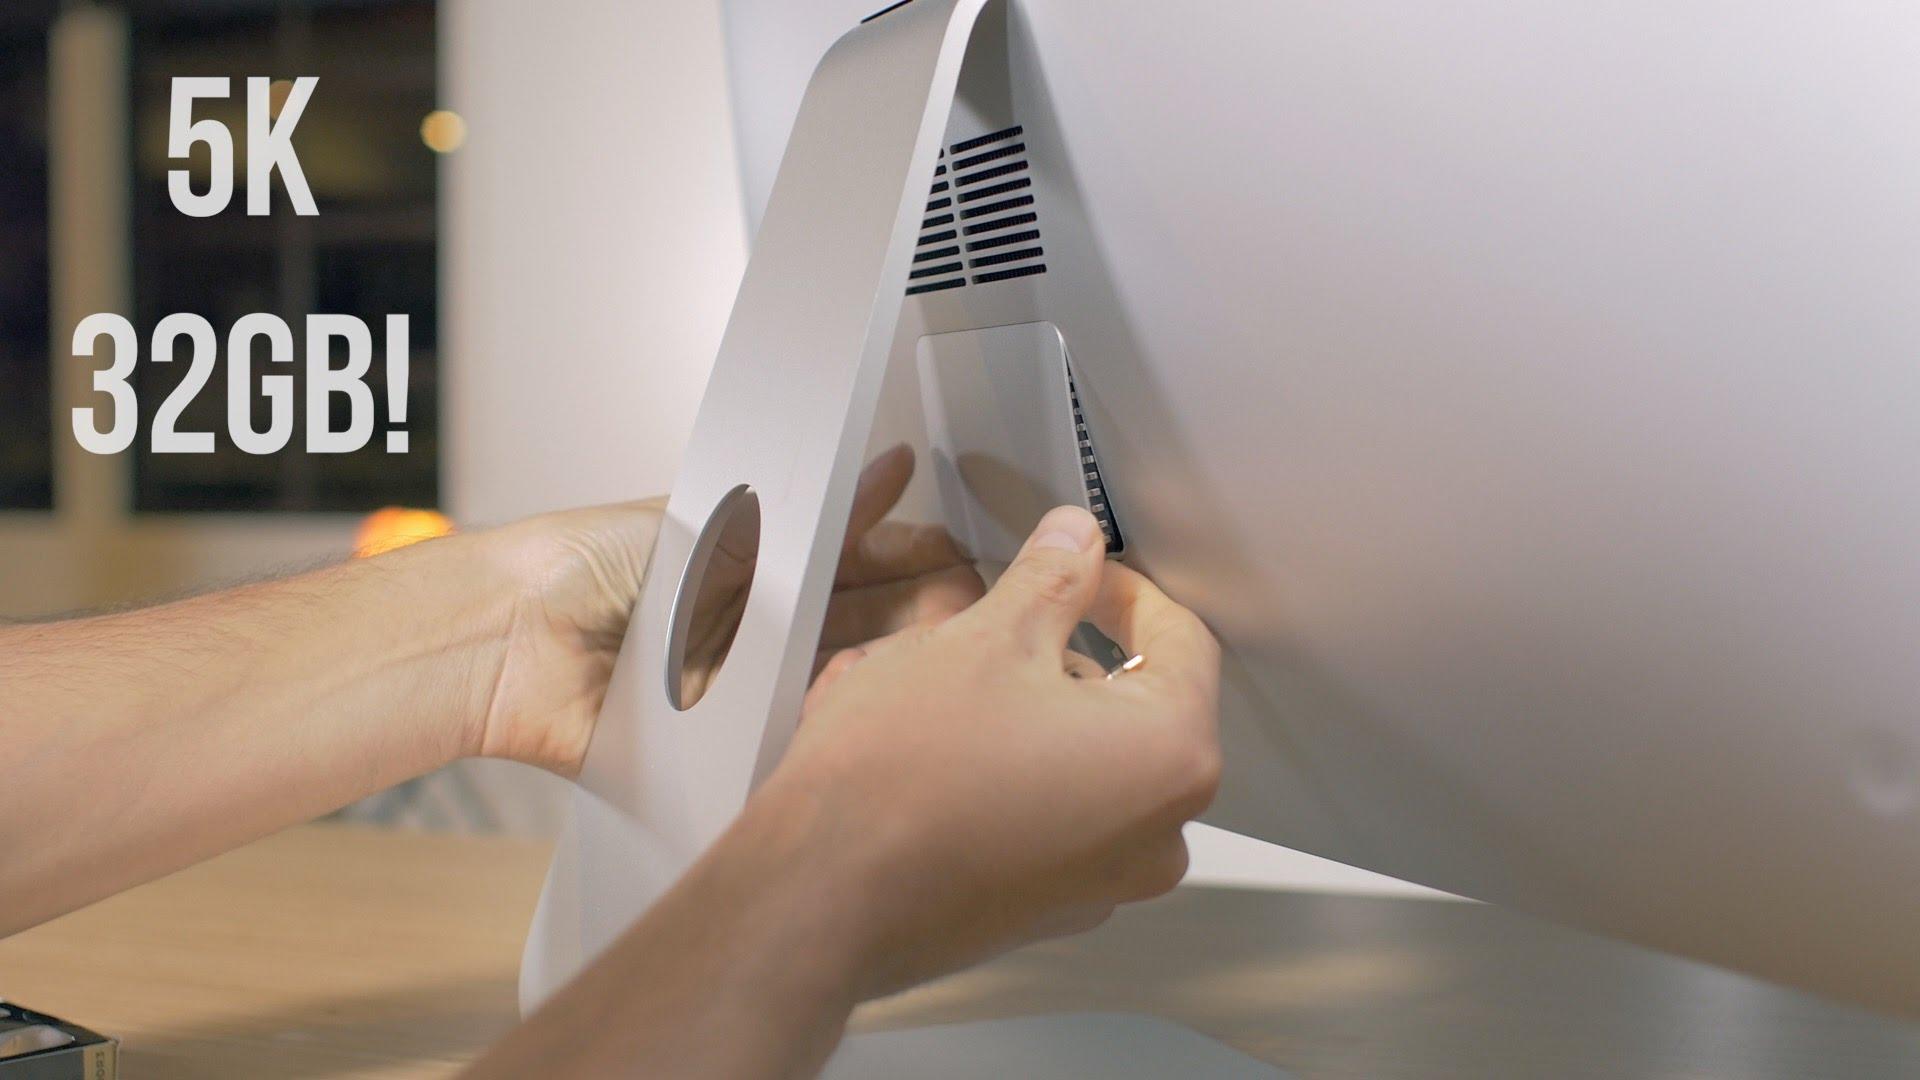 Купить iMac 27-inch 5K Mid 2017